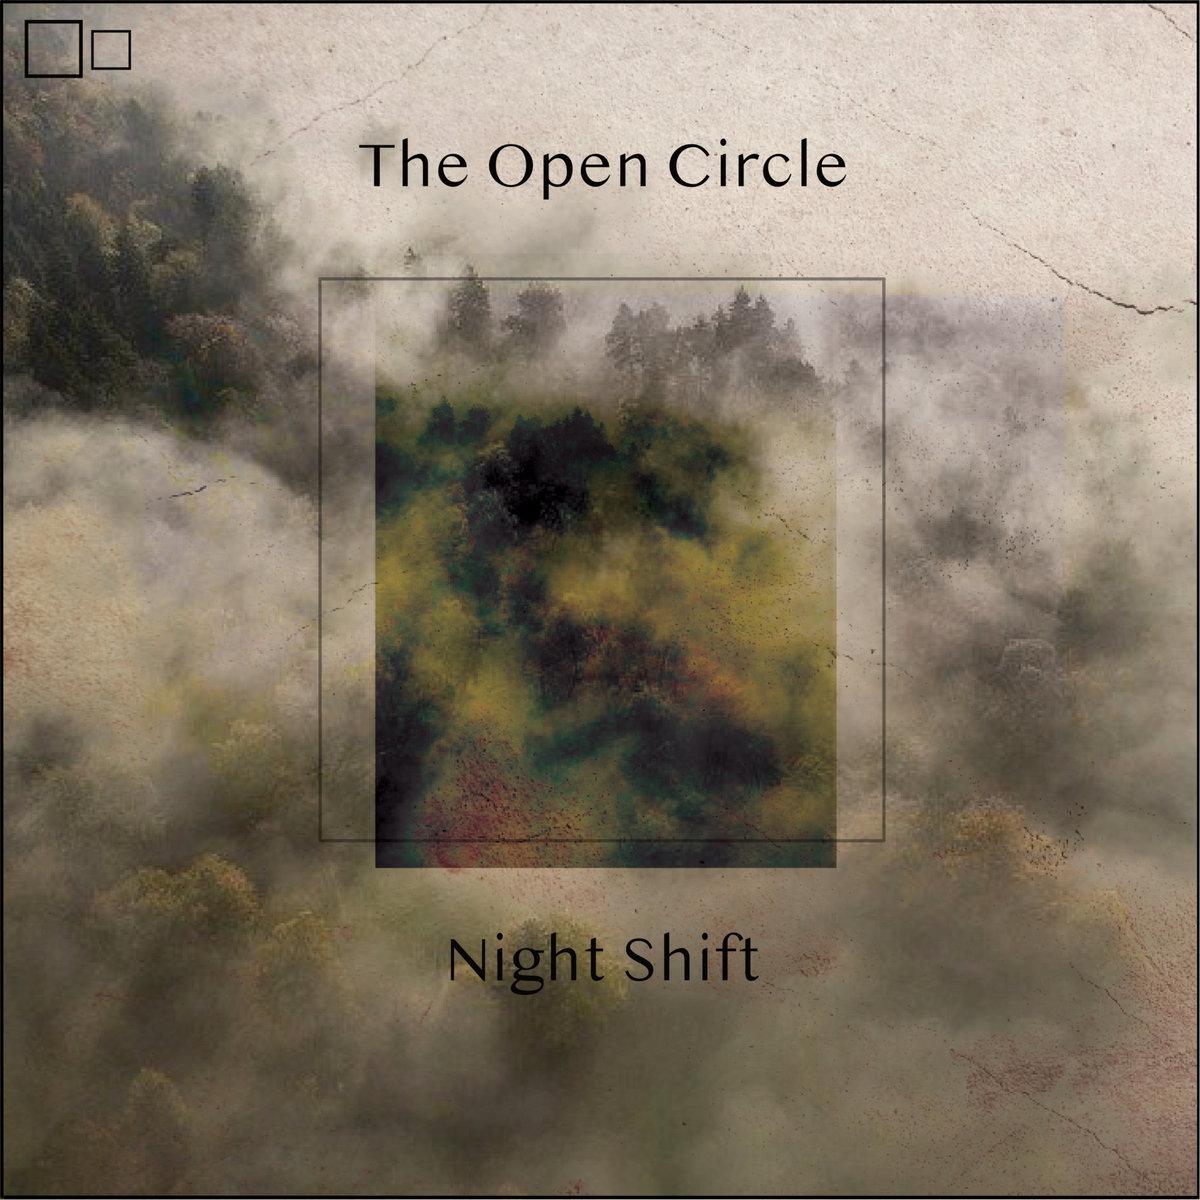 The Open Circle – Night Shift